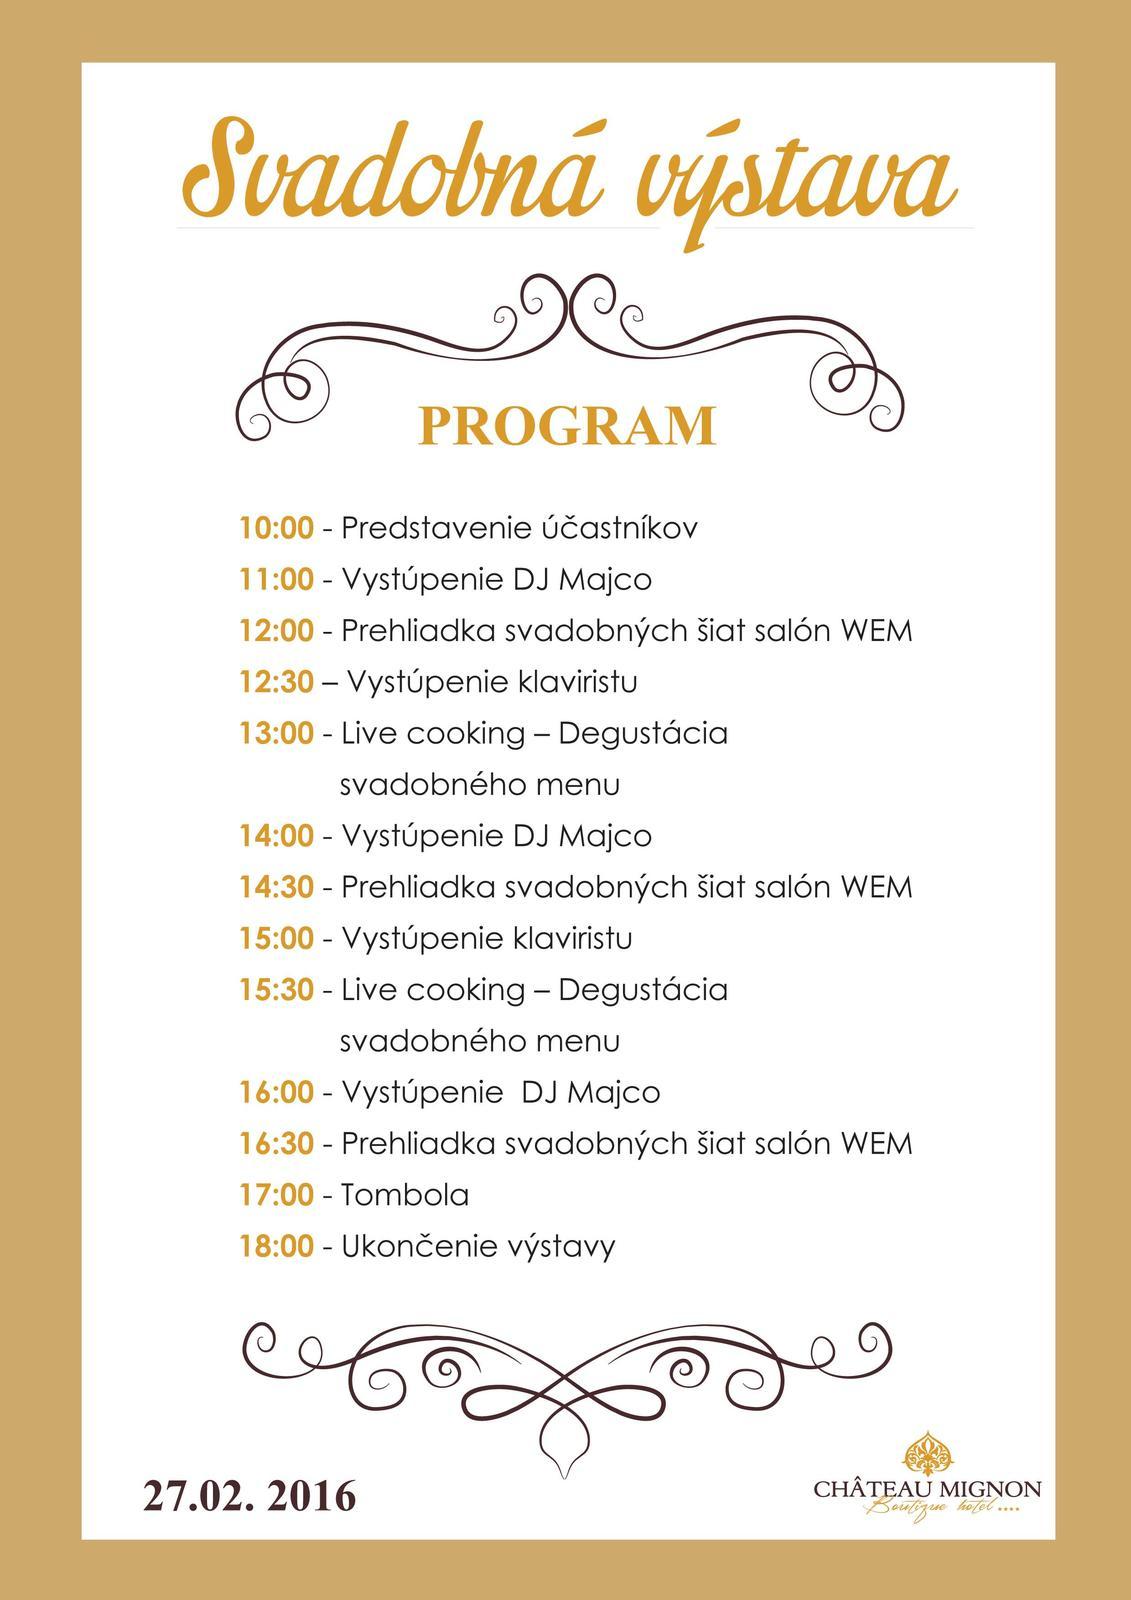 Svadobná výstava - Pozvánka na výstavu . Už zajtra sa na Vás tešíme v Chateau Mignon od 10.00 - 18.00 v Dubnici nad Váhom